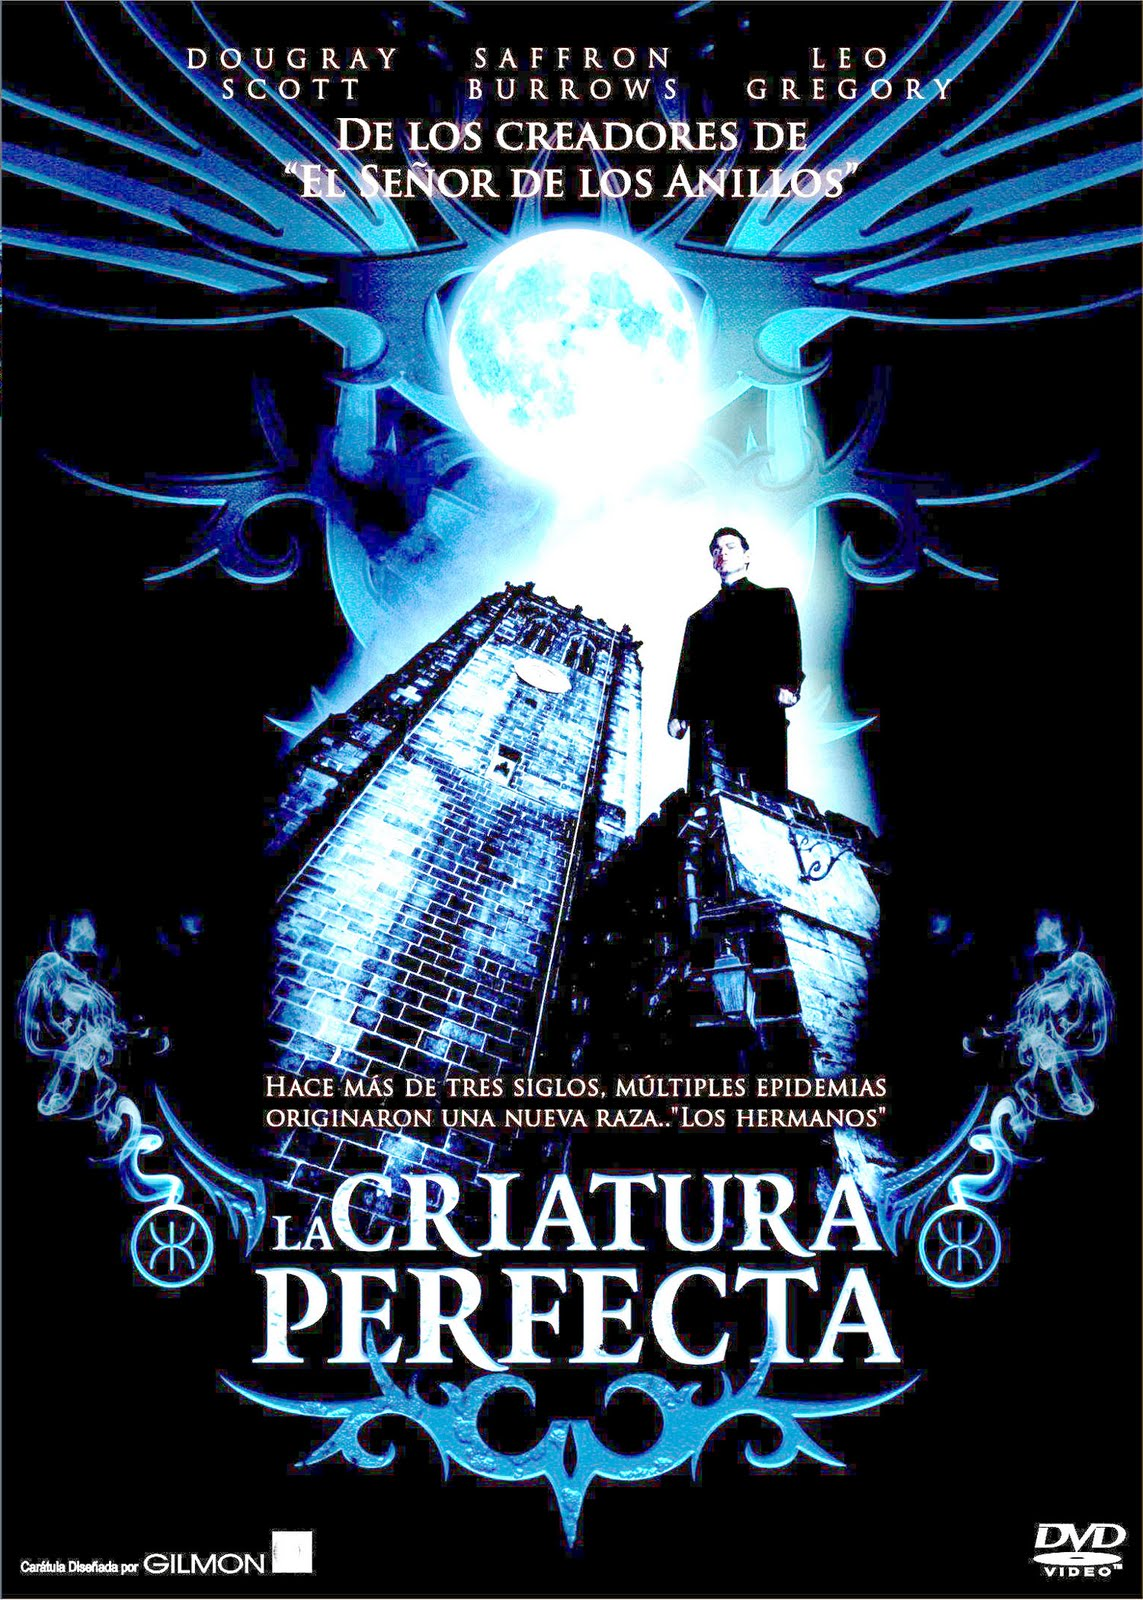 La criatura perfecta (2007)